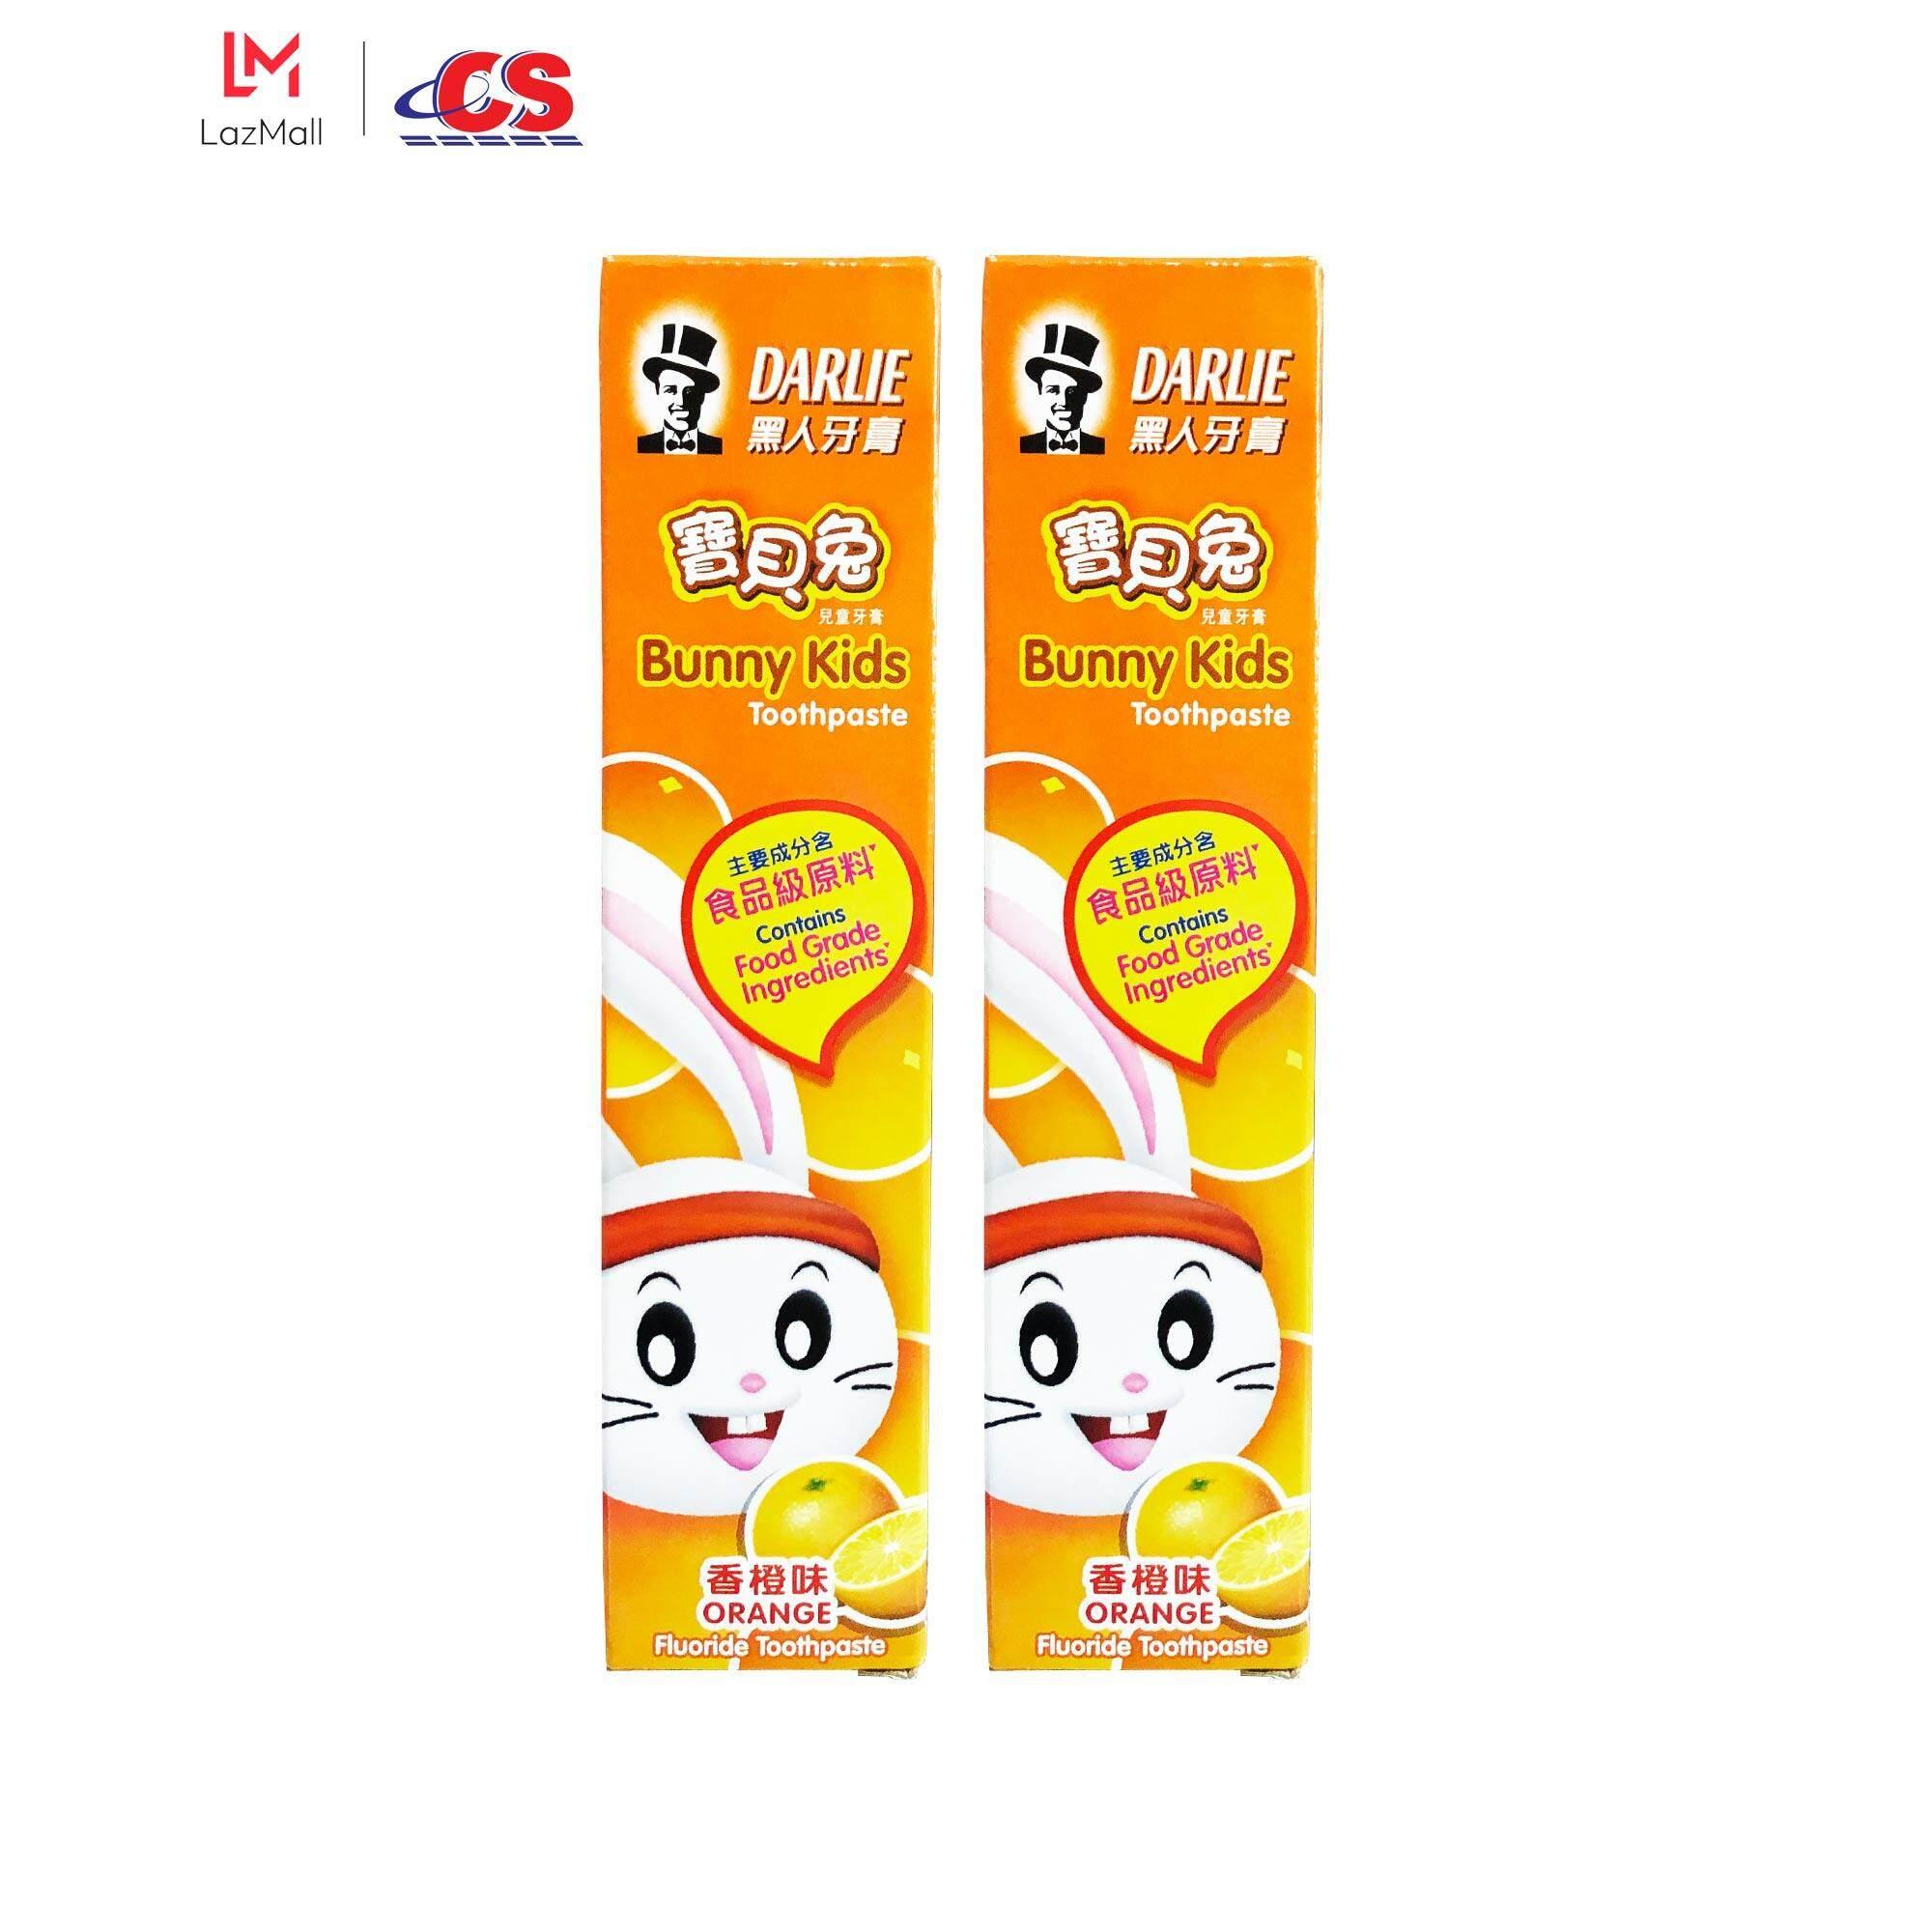 DARLIE Toothpaste for Kids Orange Twin Pack (2s x 40g)